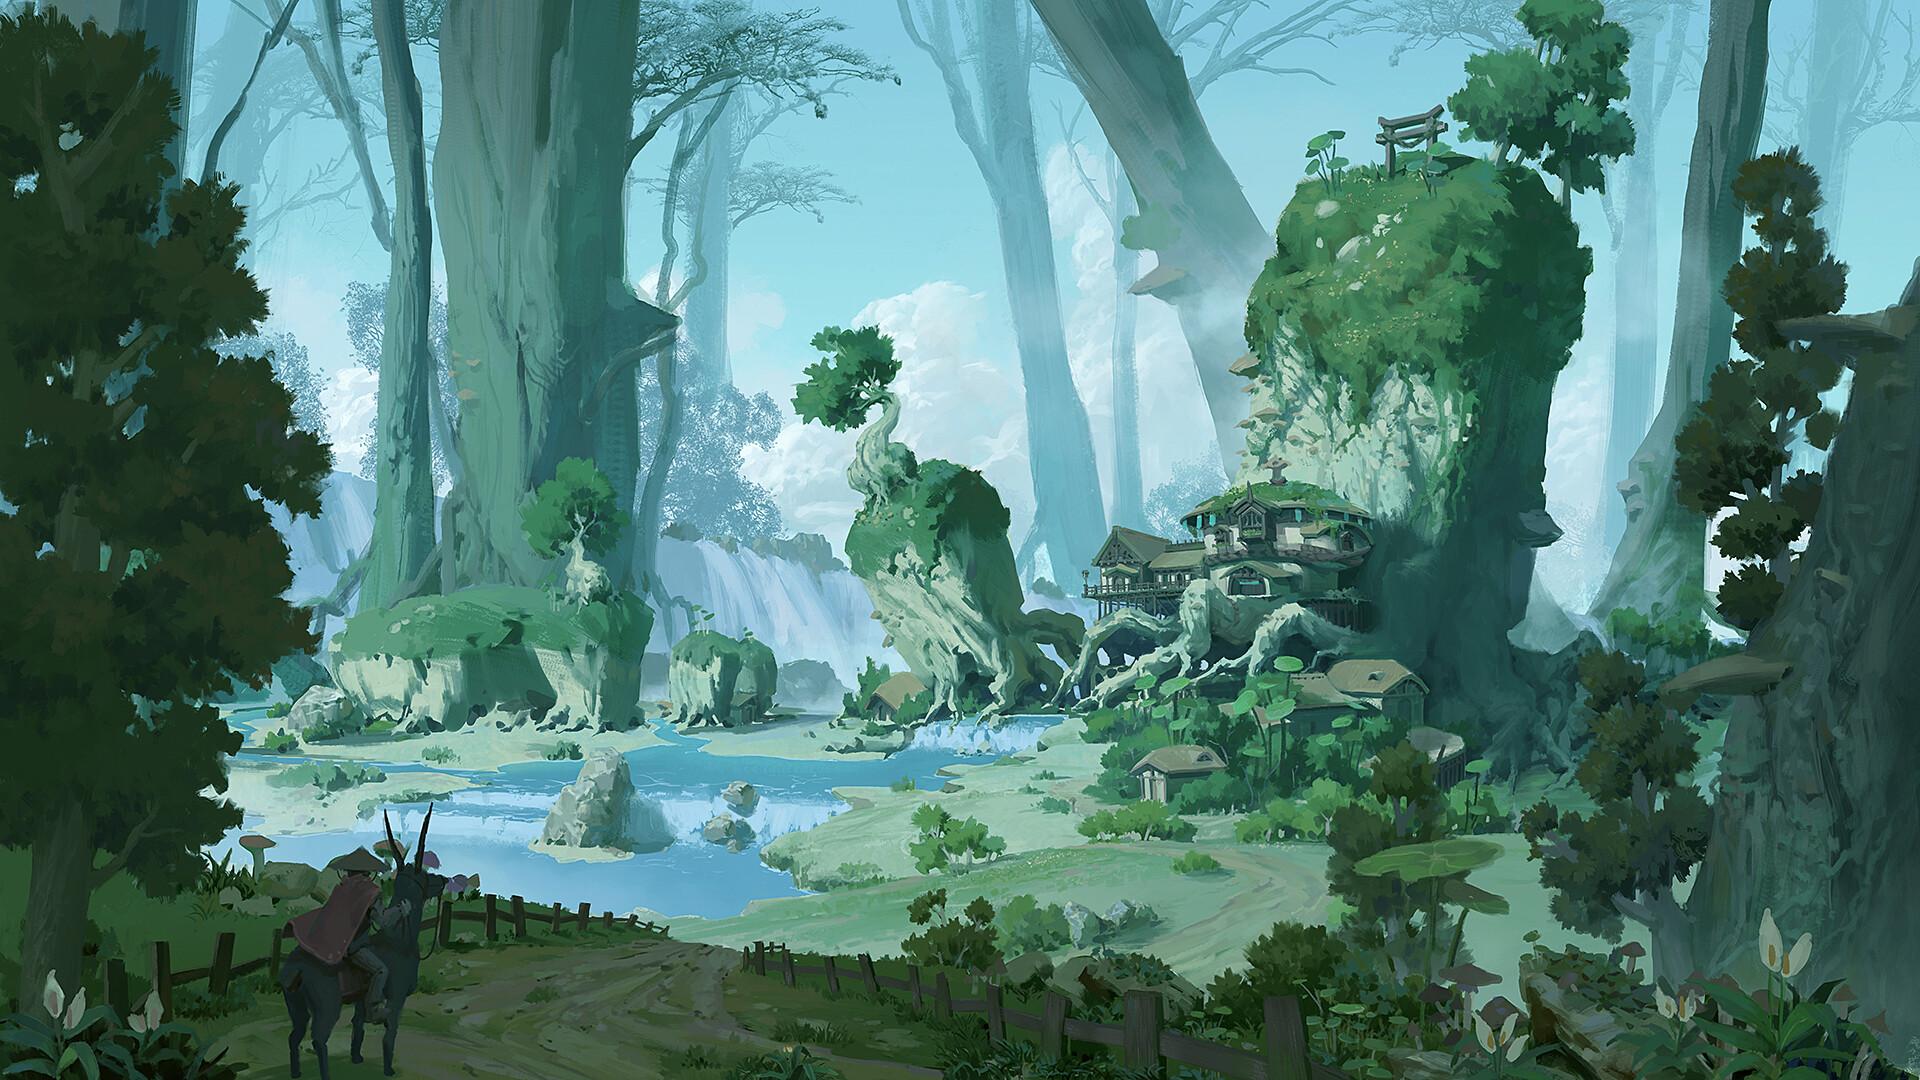 General 1920x1080 fantasy art digital art river forest village waterfall mushroom Pixel Cat fence